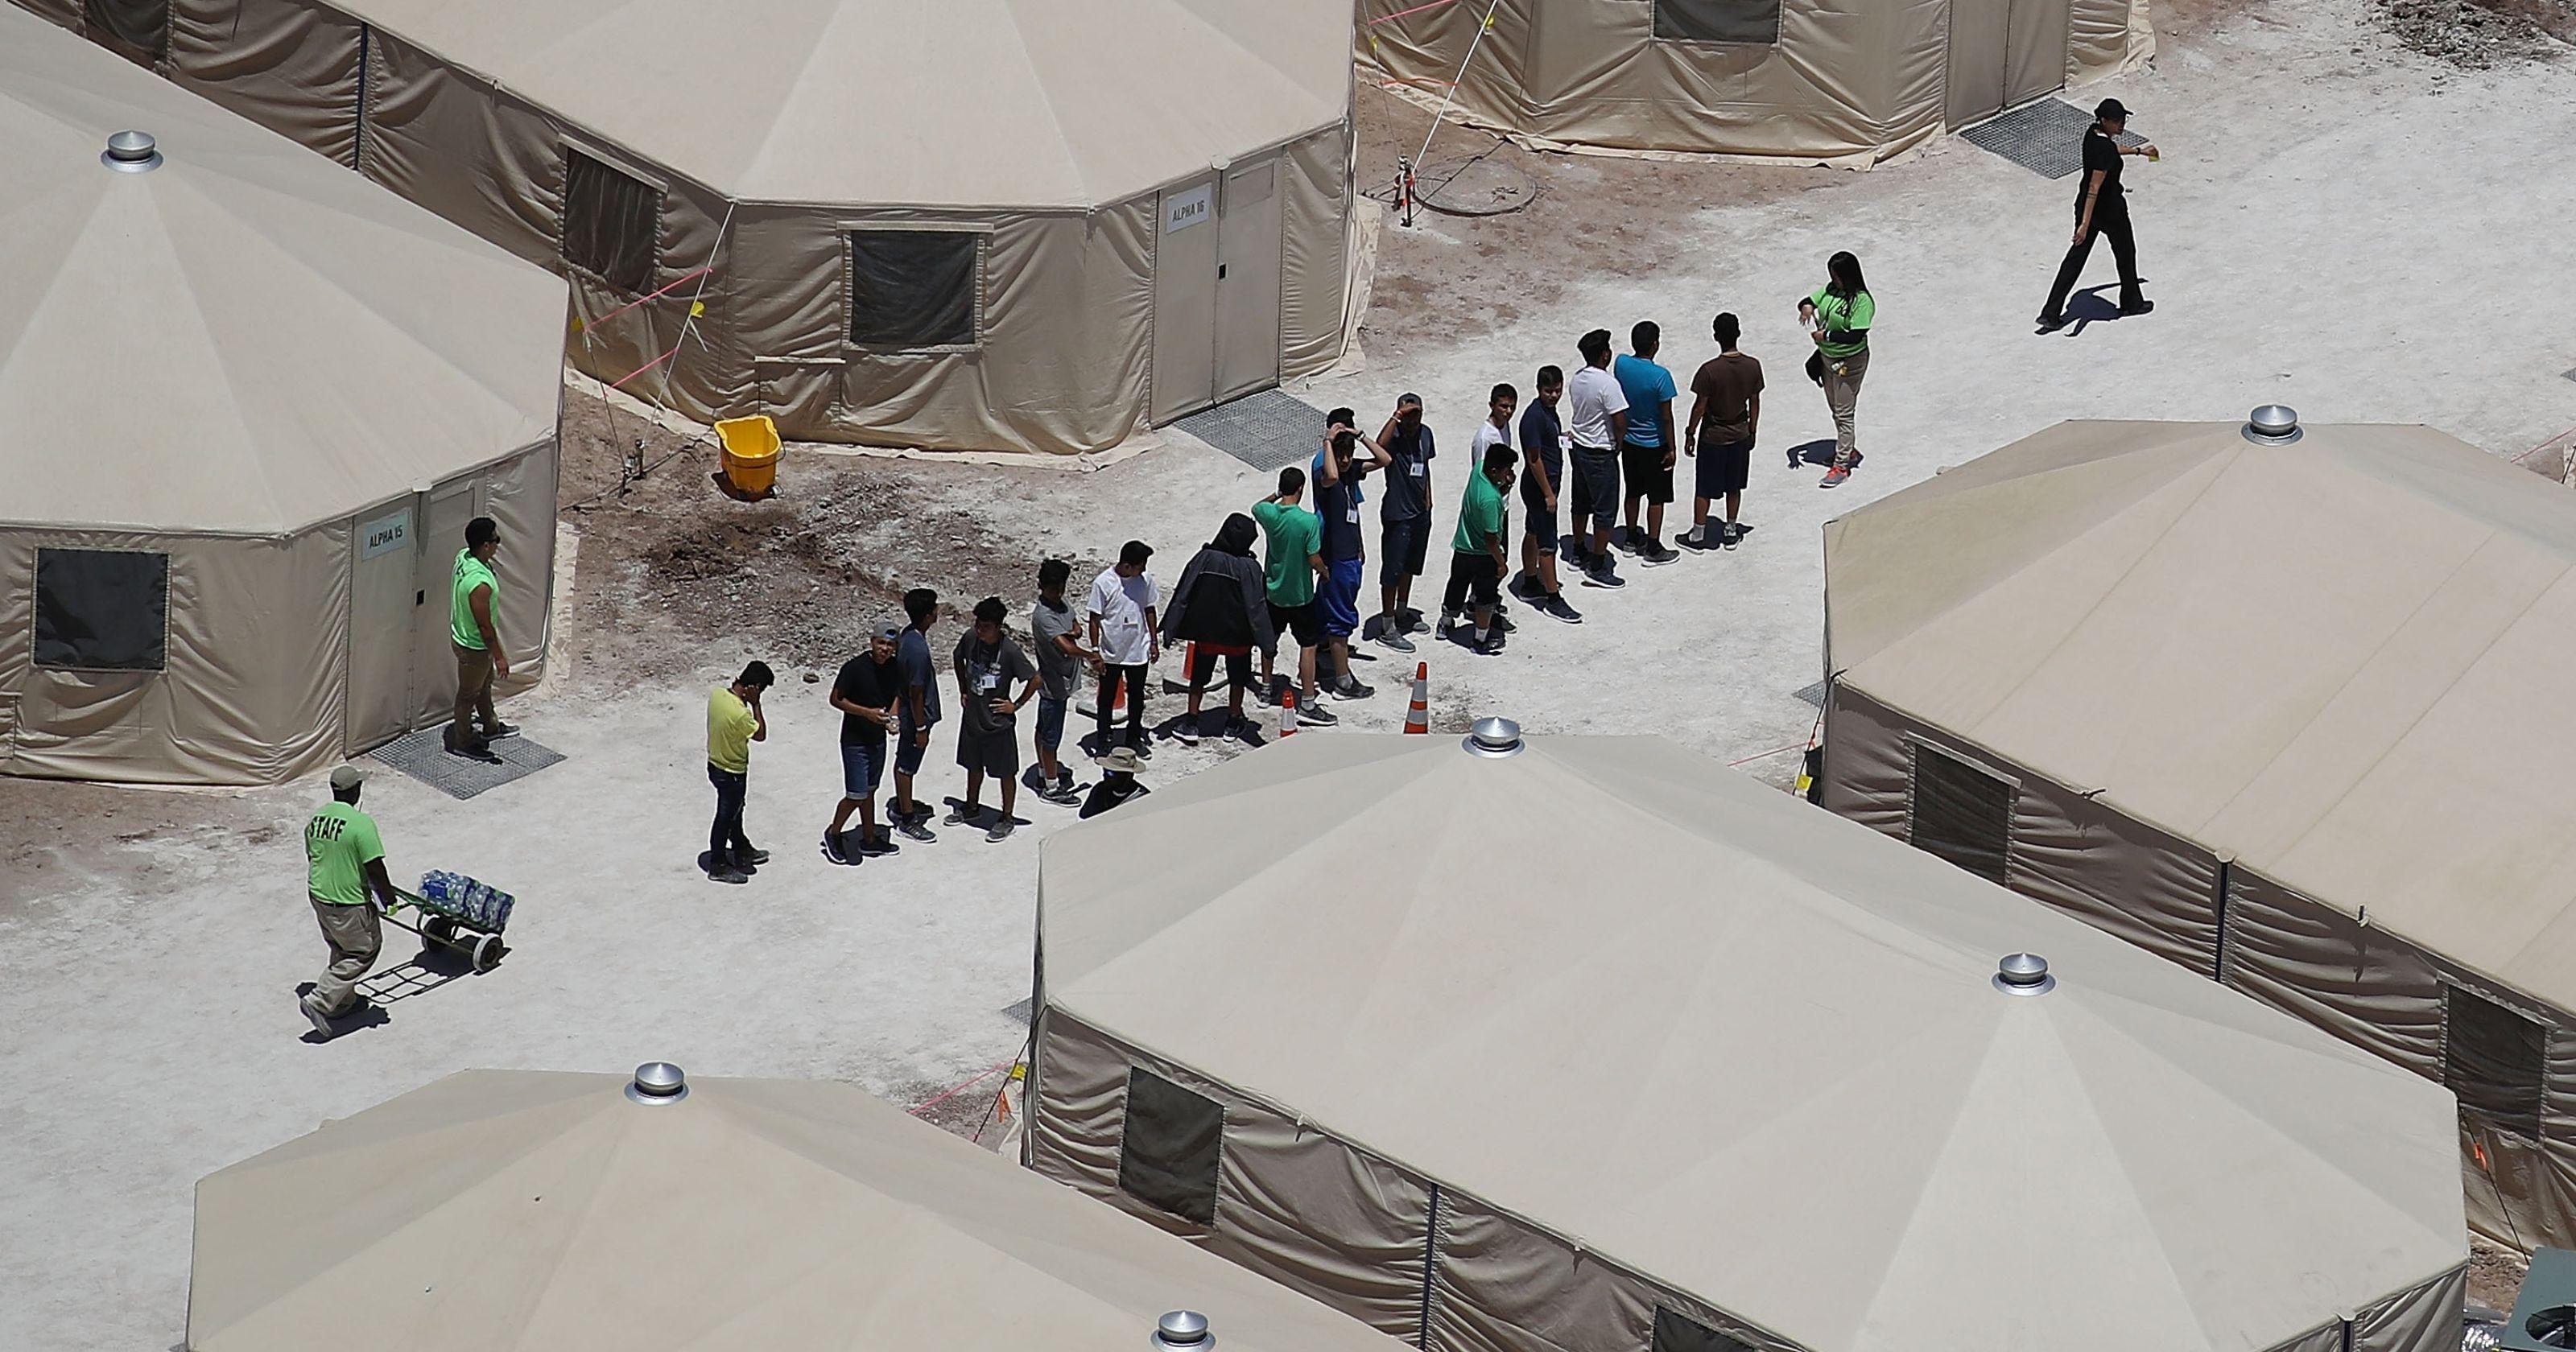 Pin On Migrants Crisis